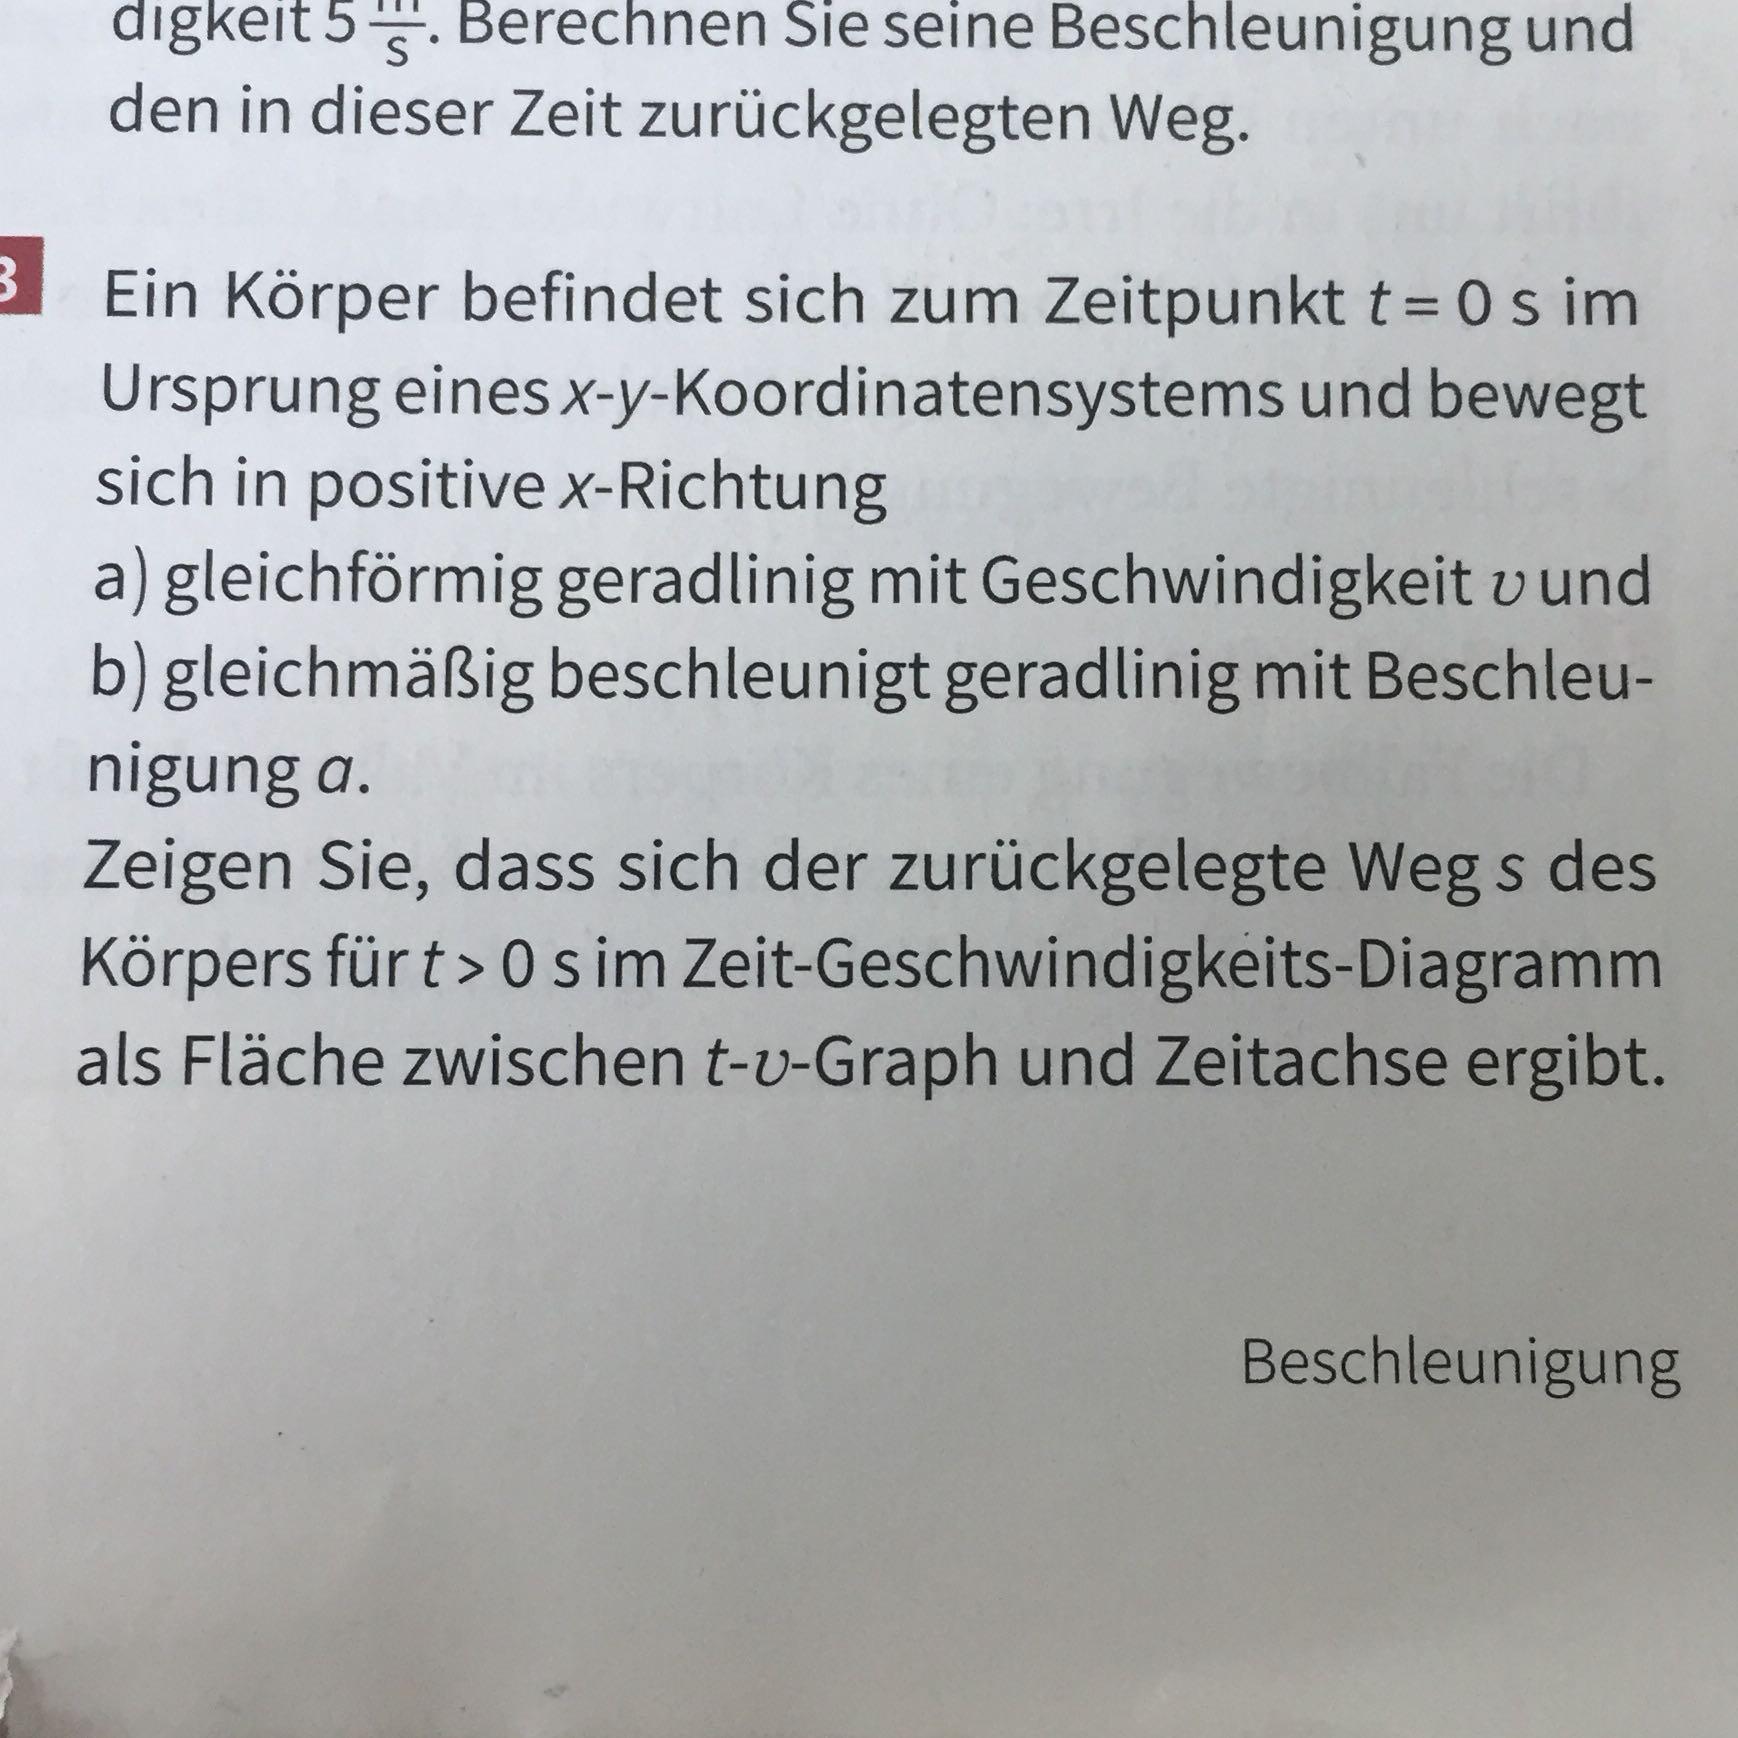 Physik Hilfe t v Diagramm? (Schule, TV, Zeit)